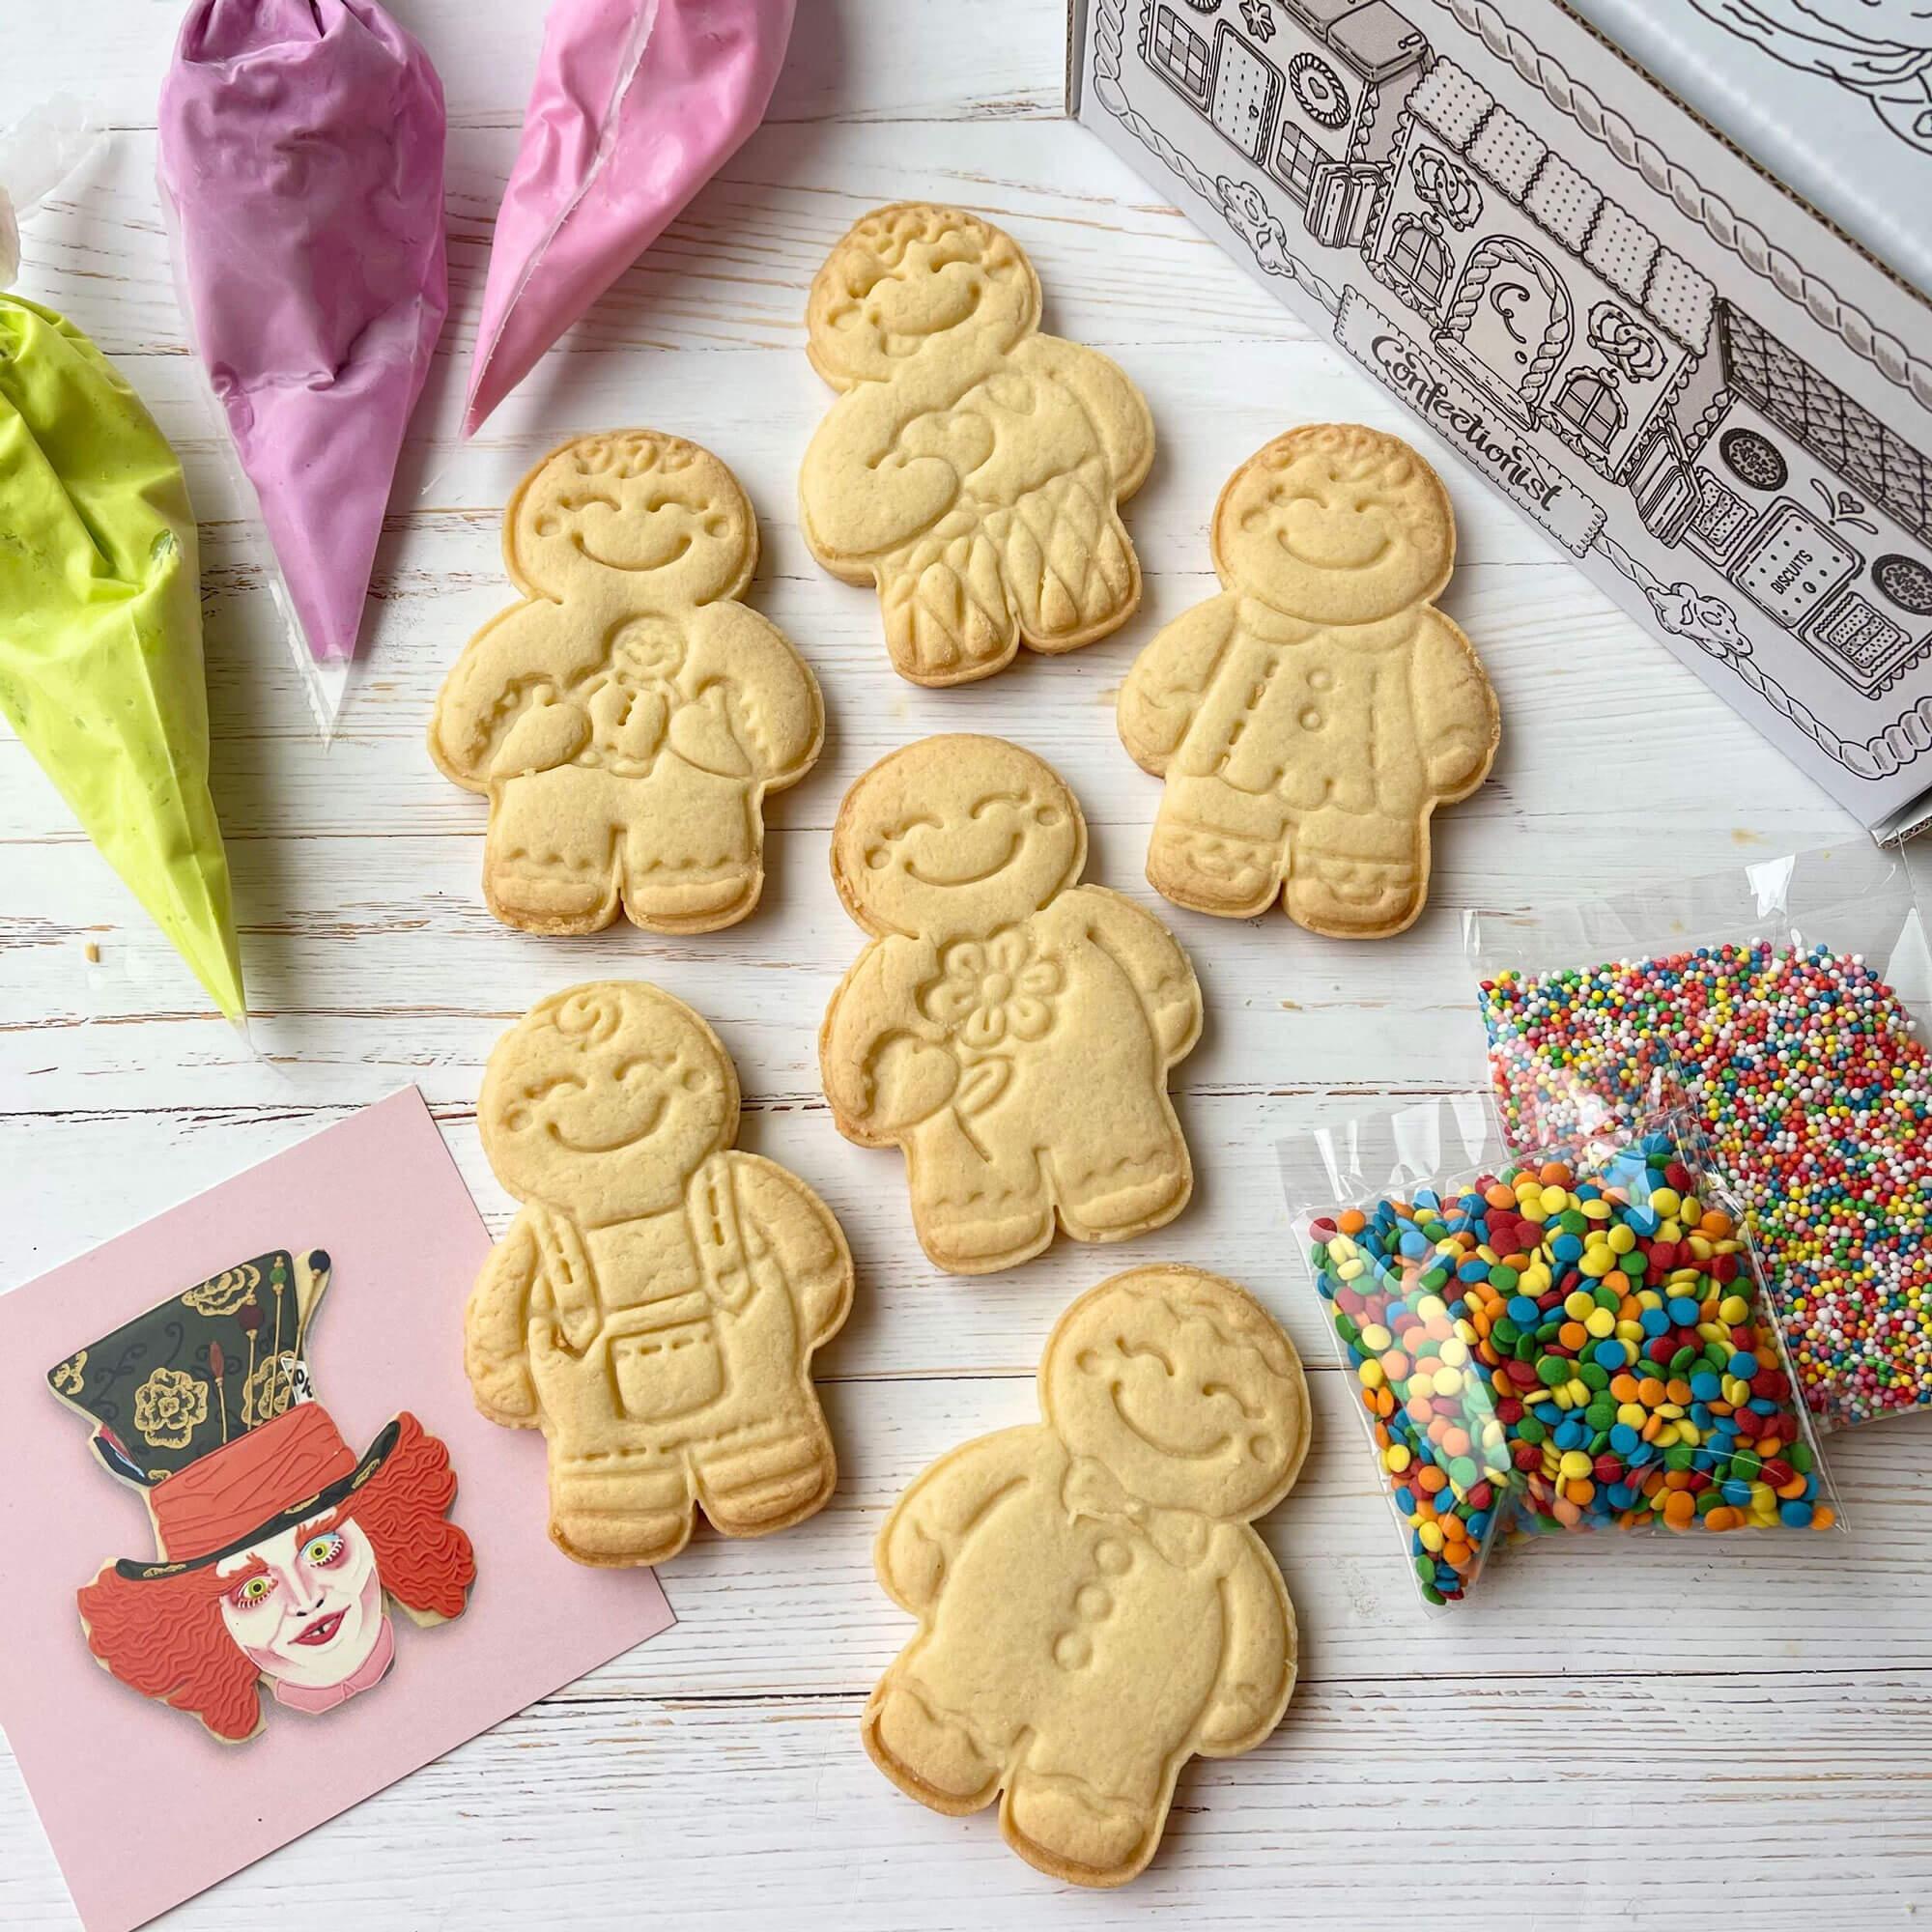 DIY Gingerbread man Decorating Kit